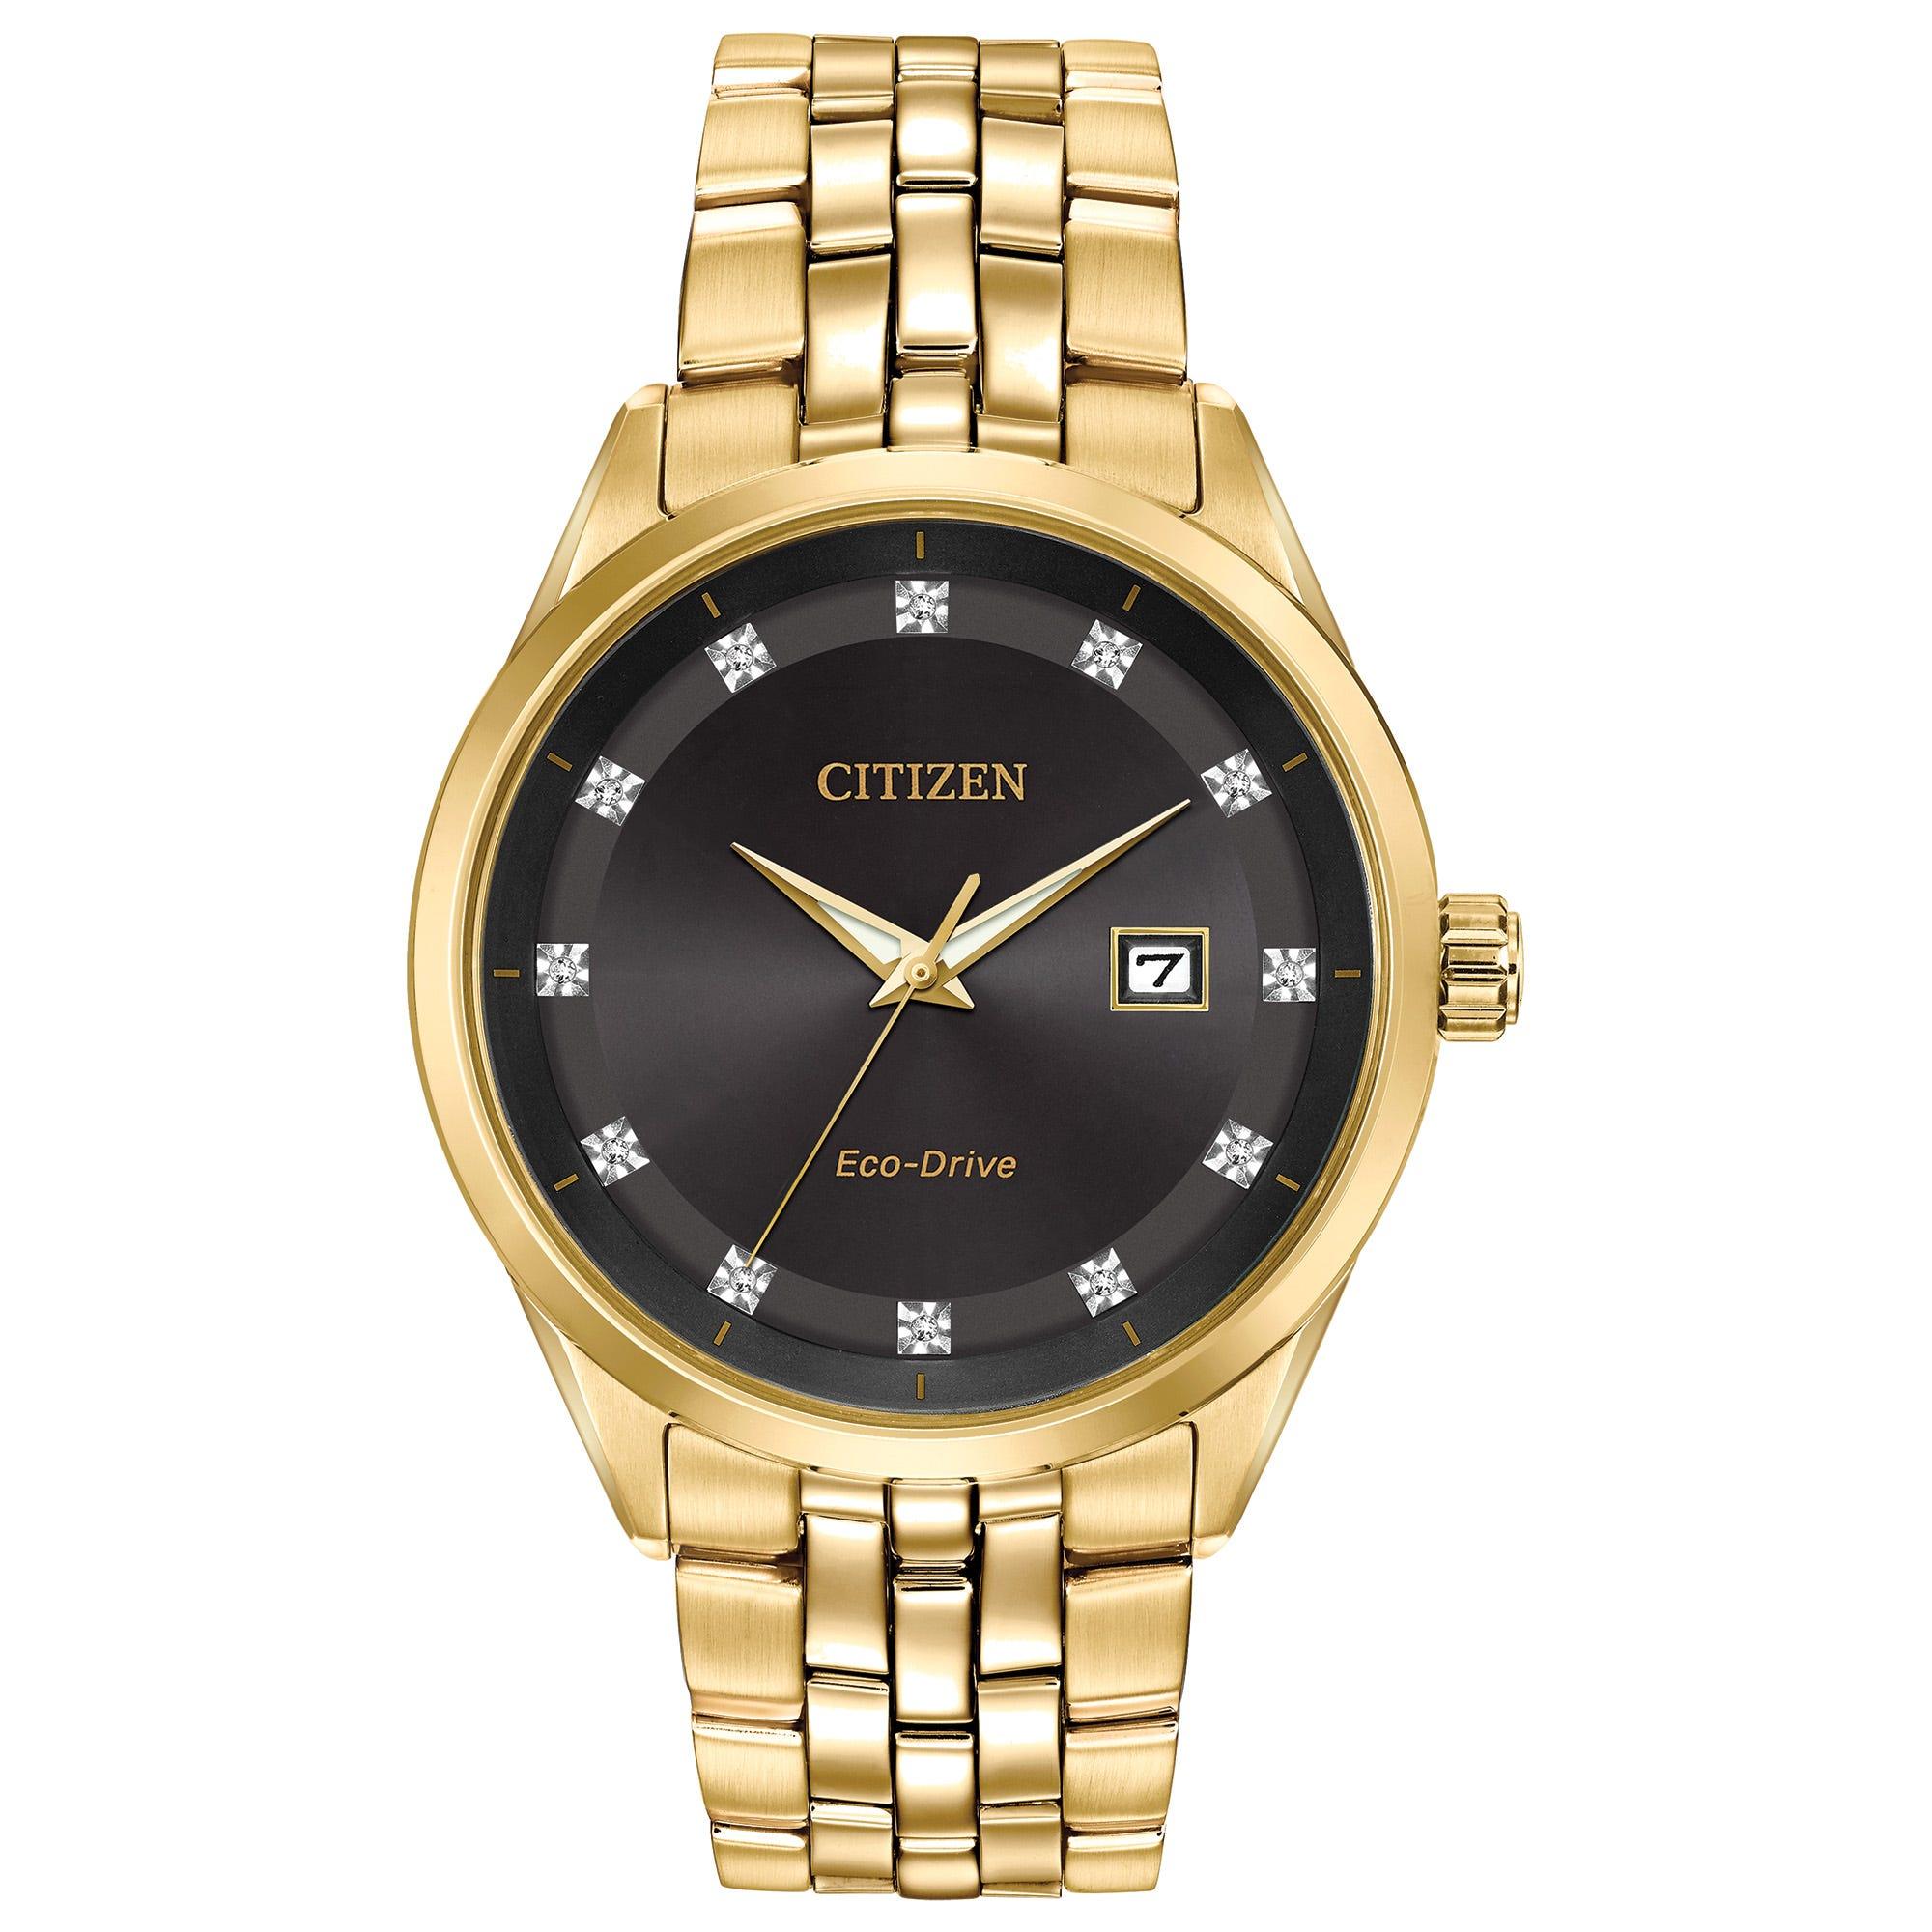 Citizen Corso Men's Watch BM7252-51G